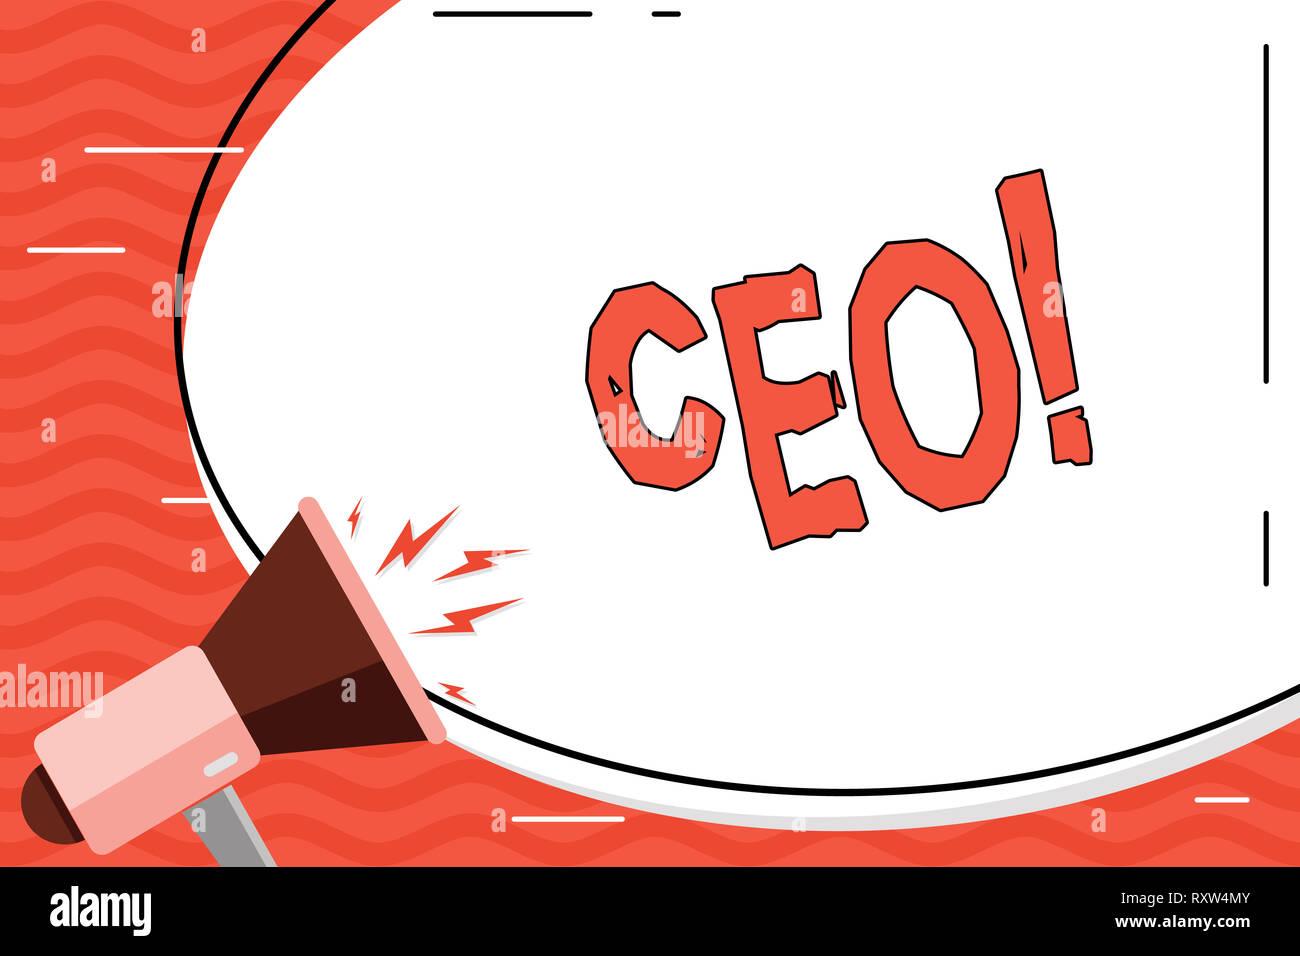 Wort schreiben Text Ceo. Business foto Präsentation Chief Executive Officer Leiter Boss Chairdemonstrating Chairanalysis Controller Stockfoto